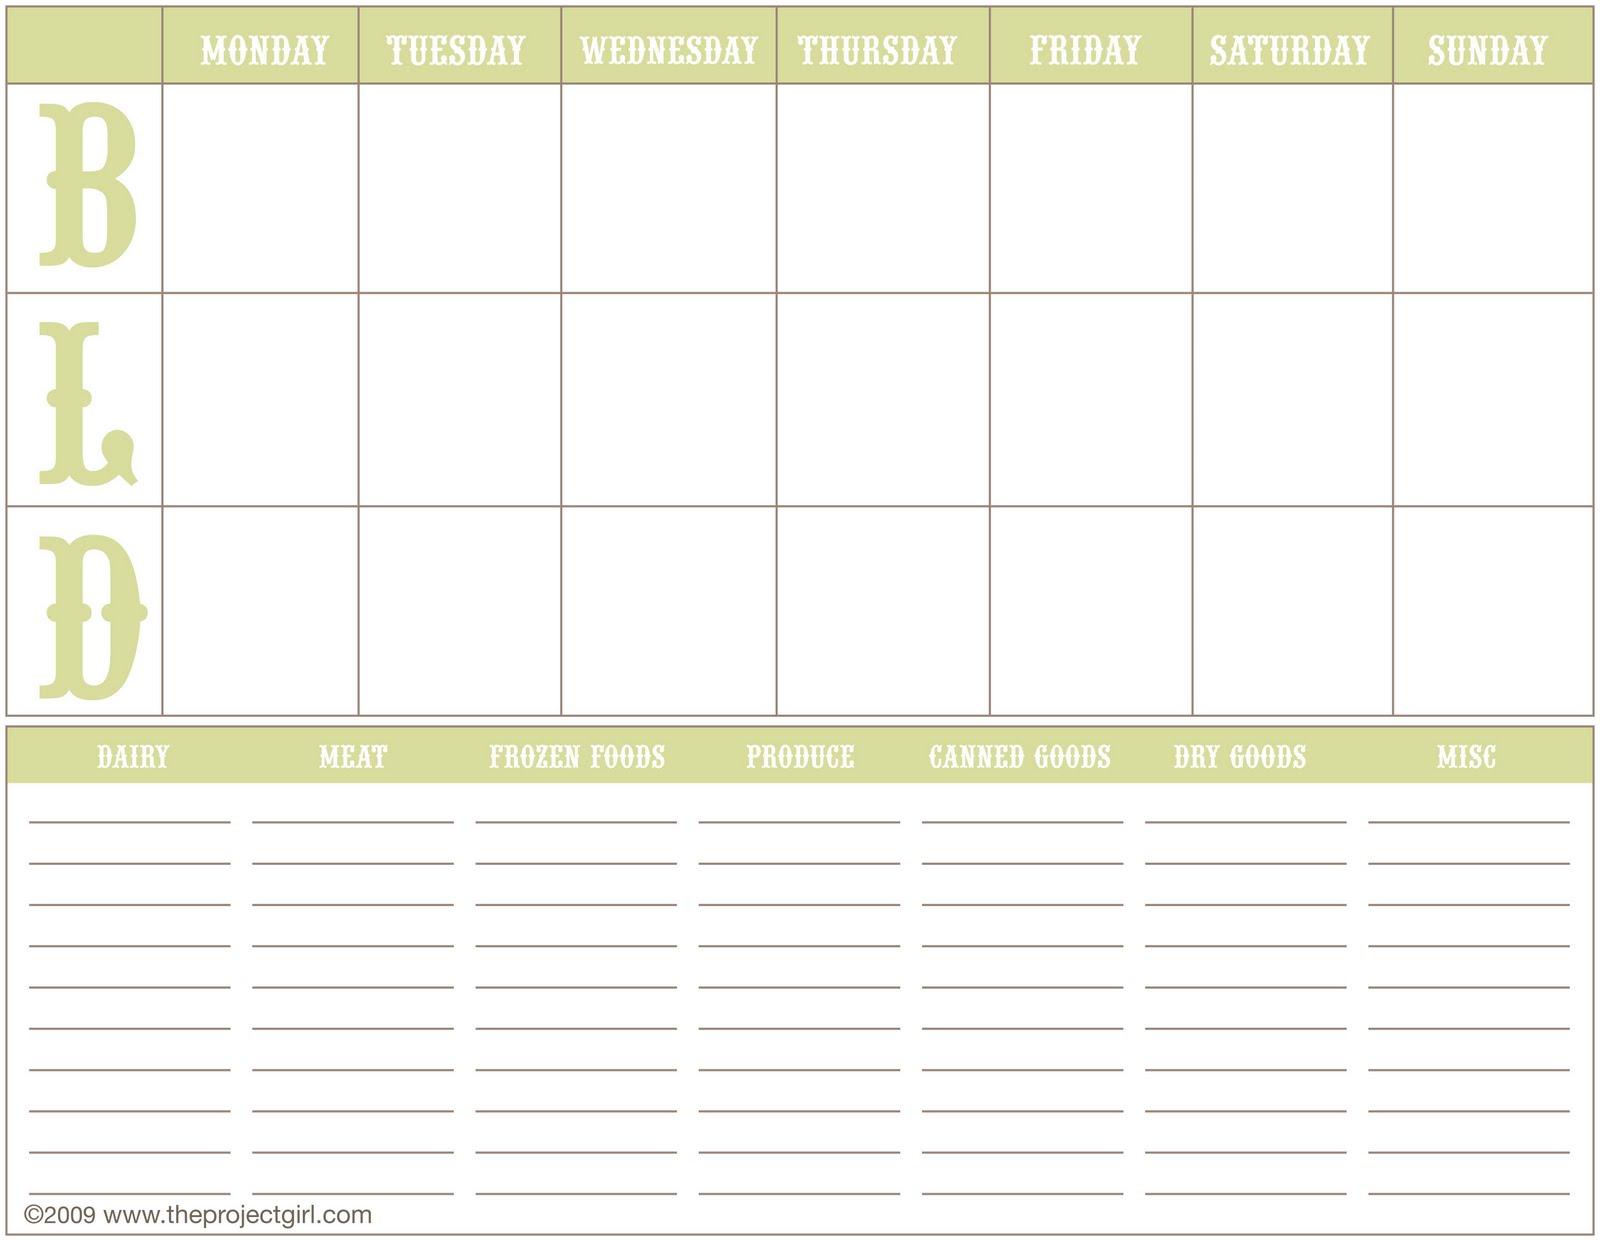 88 camping menu planner camping menu planner printable for Camping menu planner template